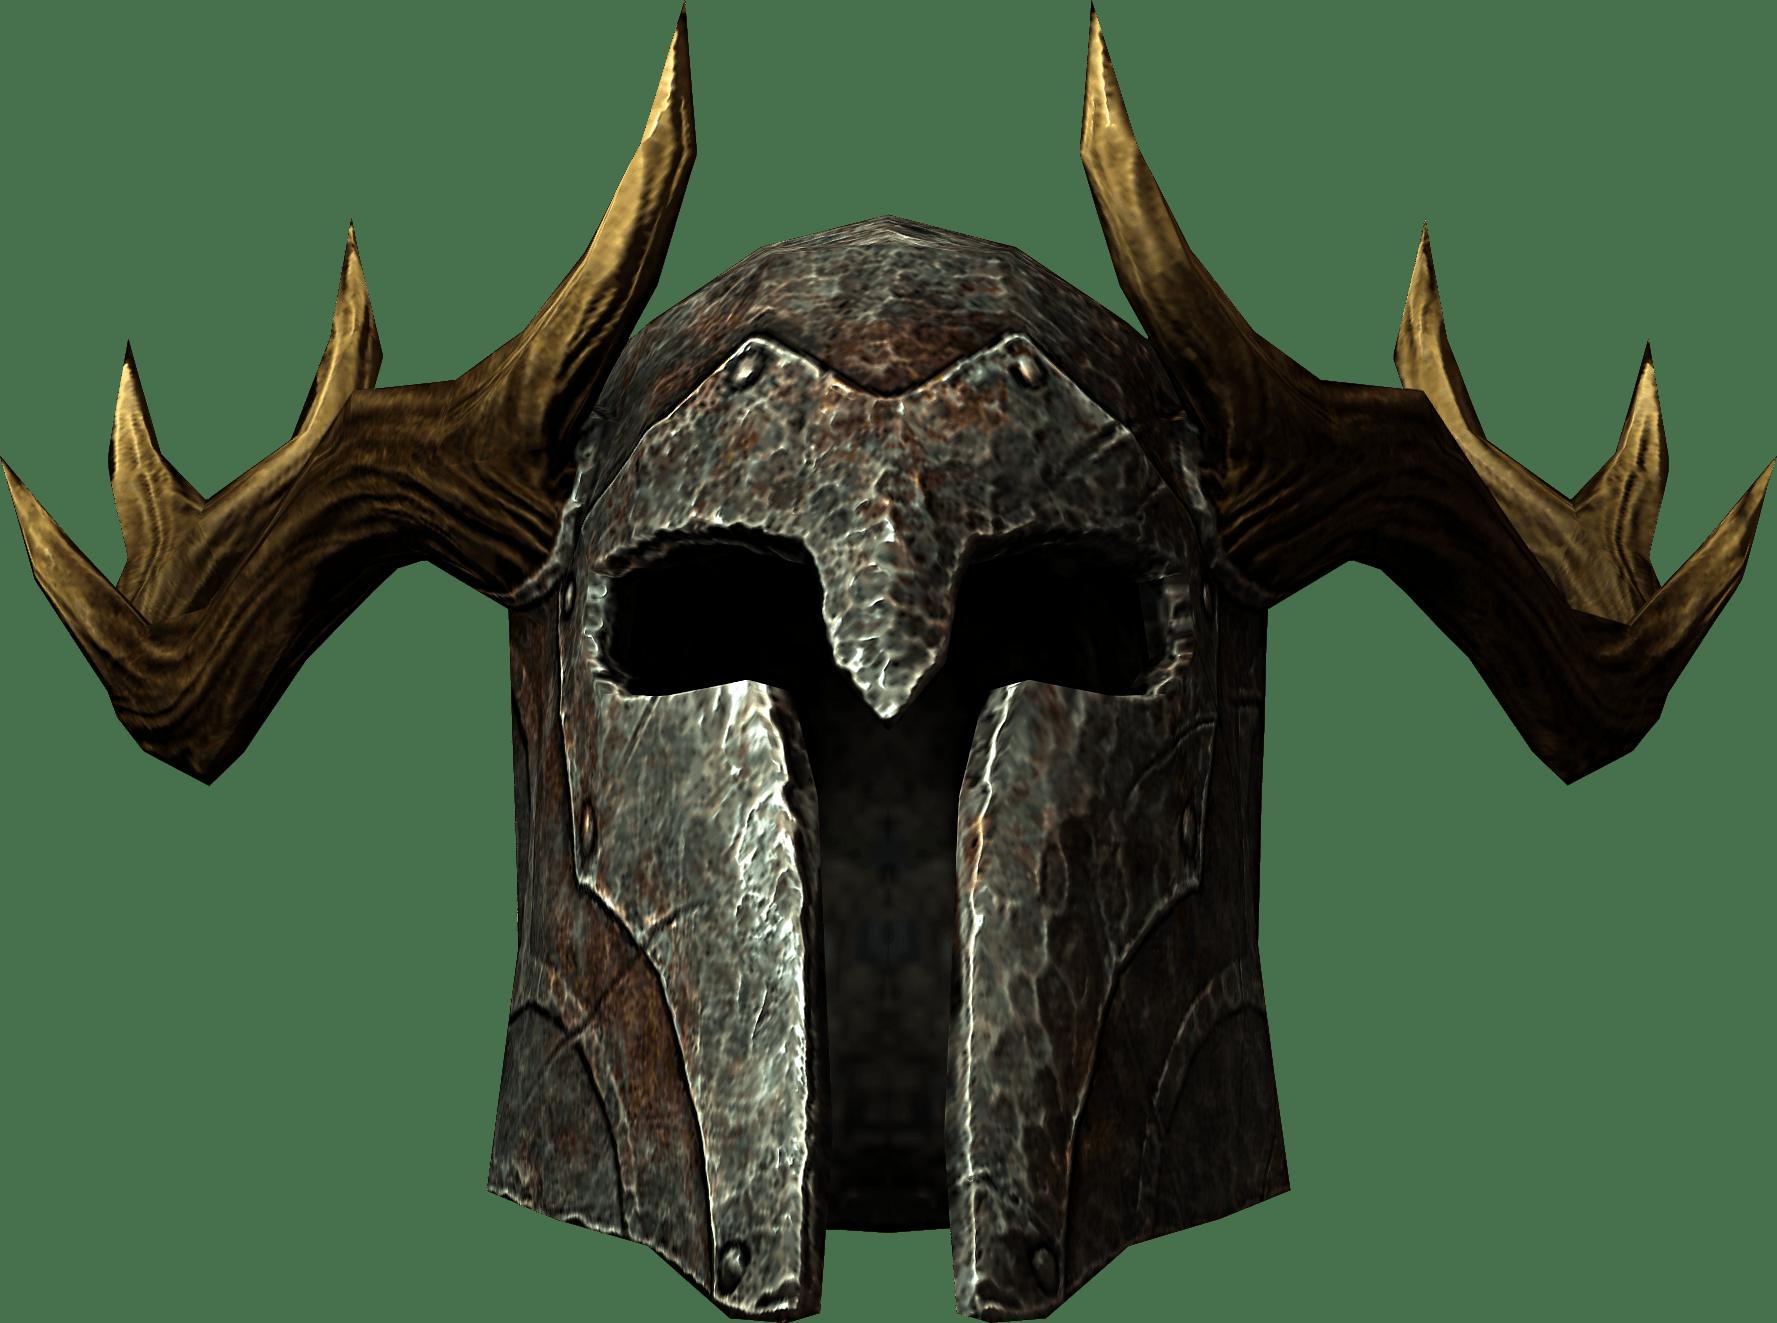 Elder Scrolls Skyrim Helmet transparent PNG.